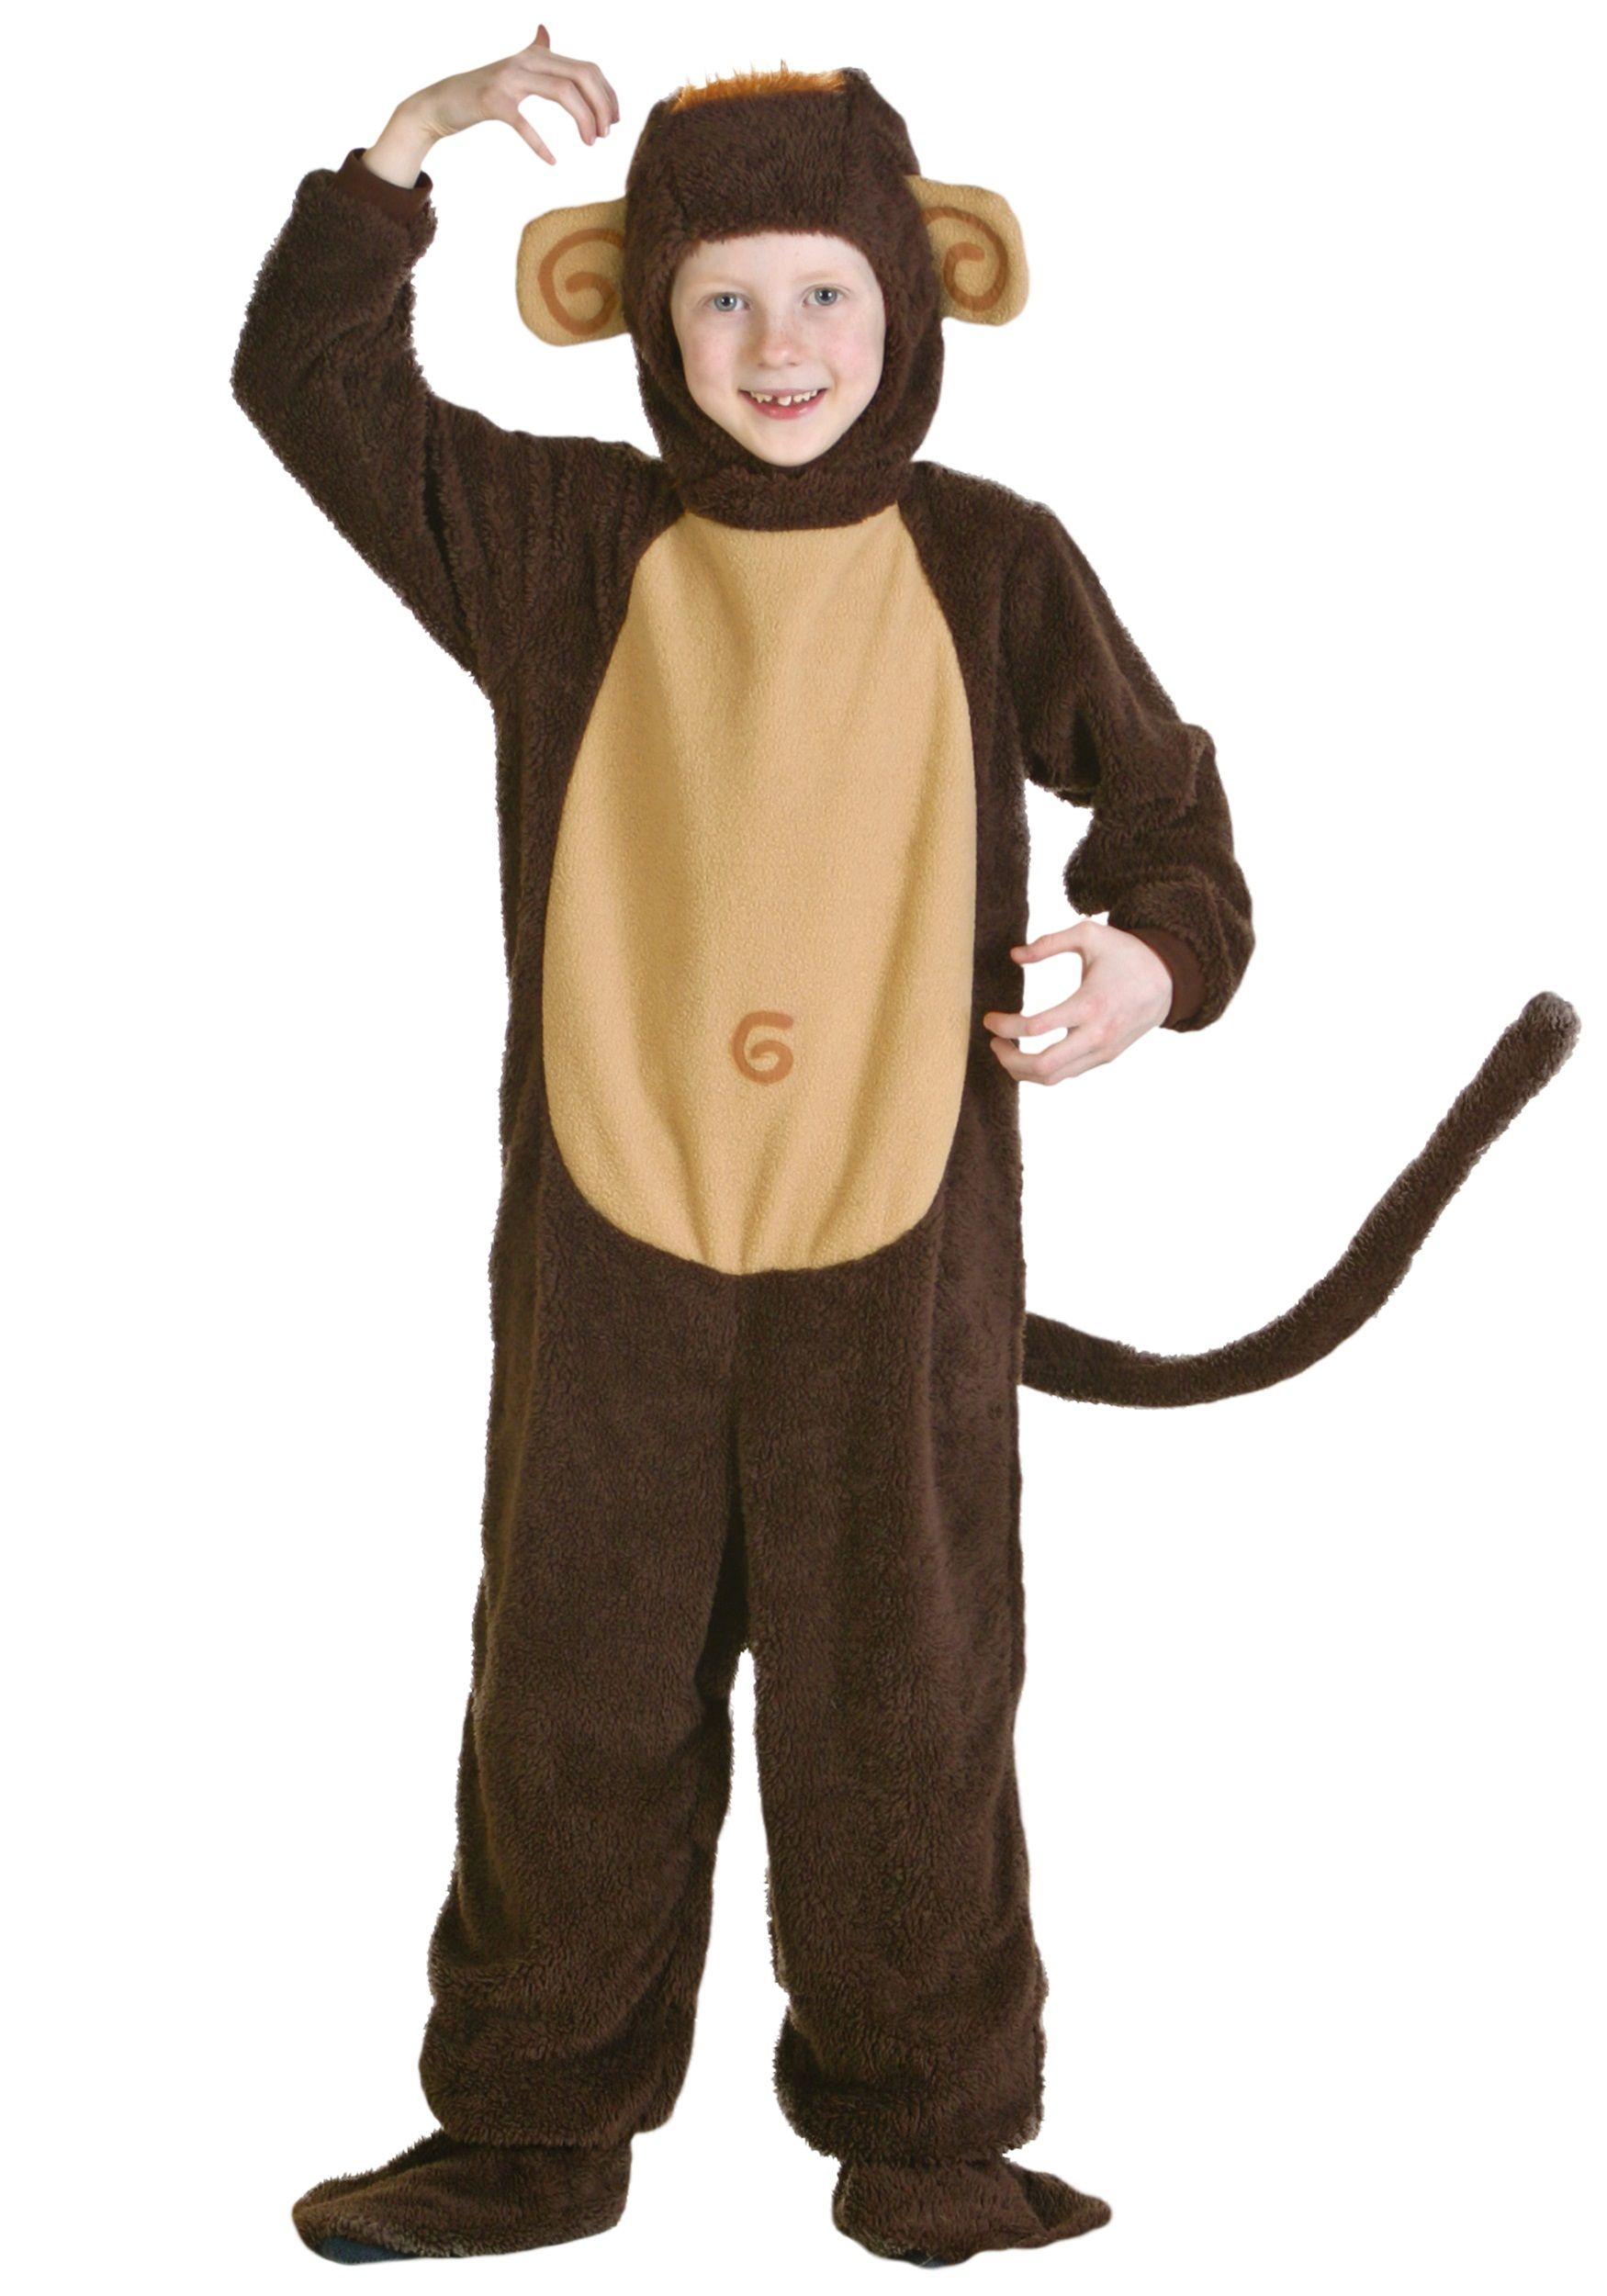 Child Monkey Costume | Monkey costumes, Costumes and Halloween ...